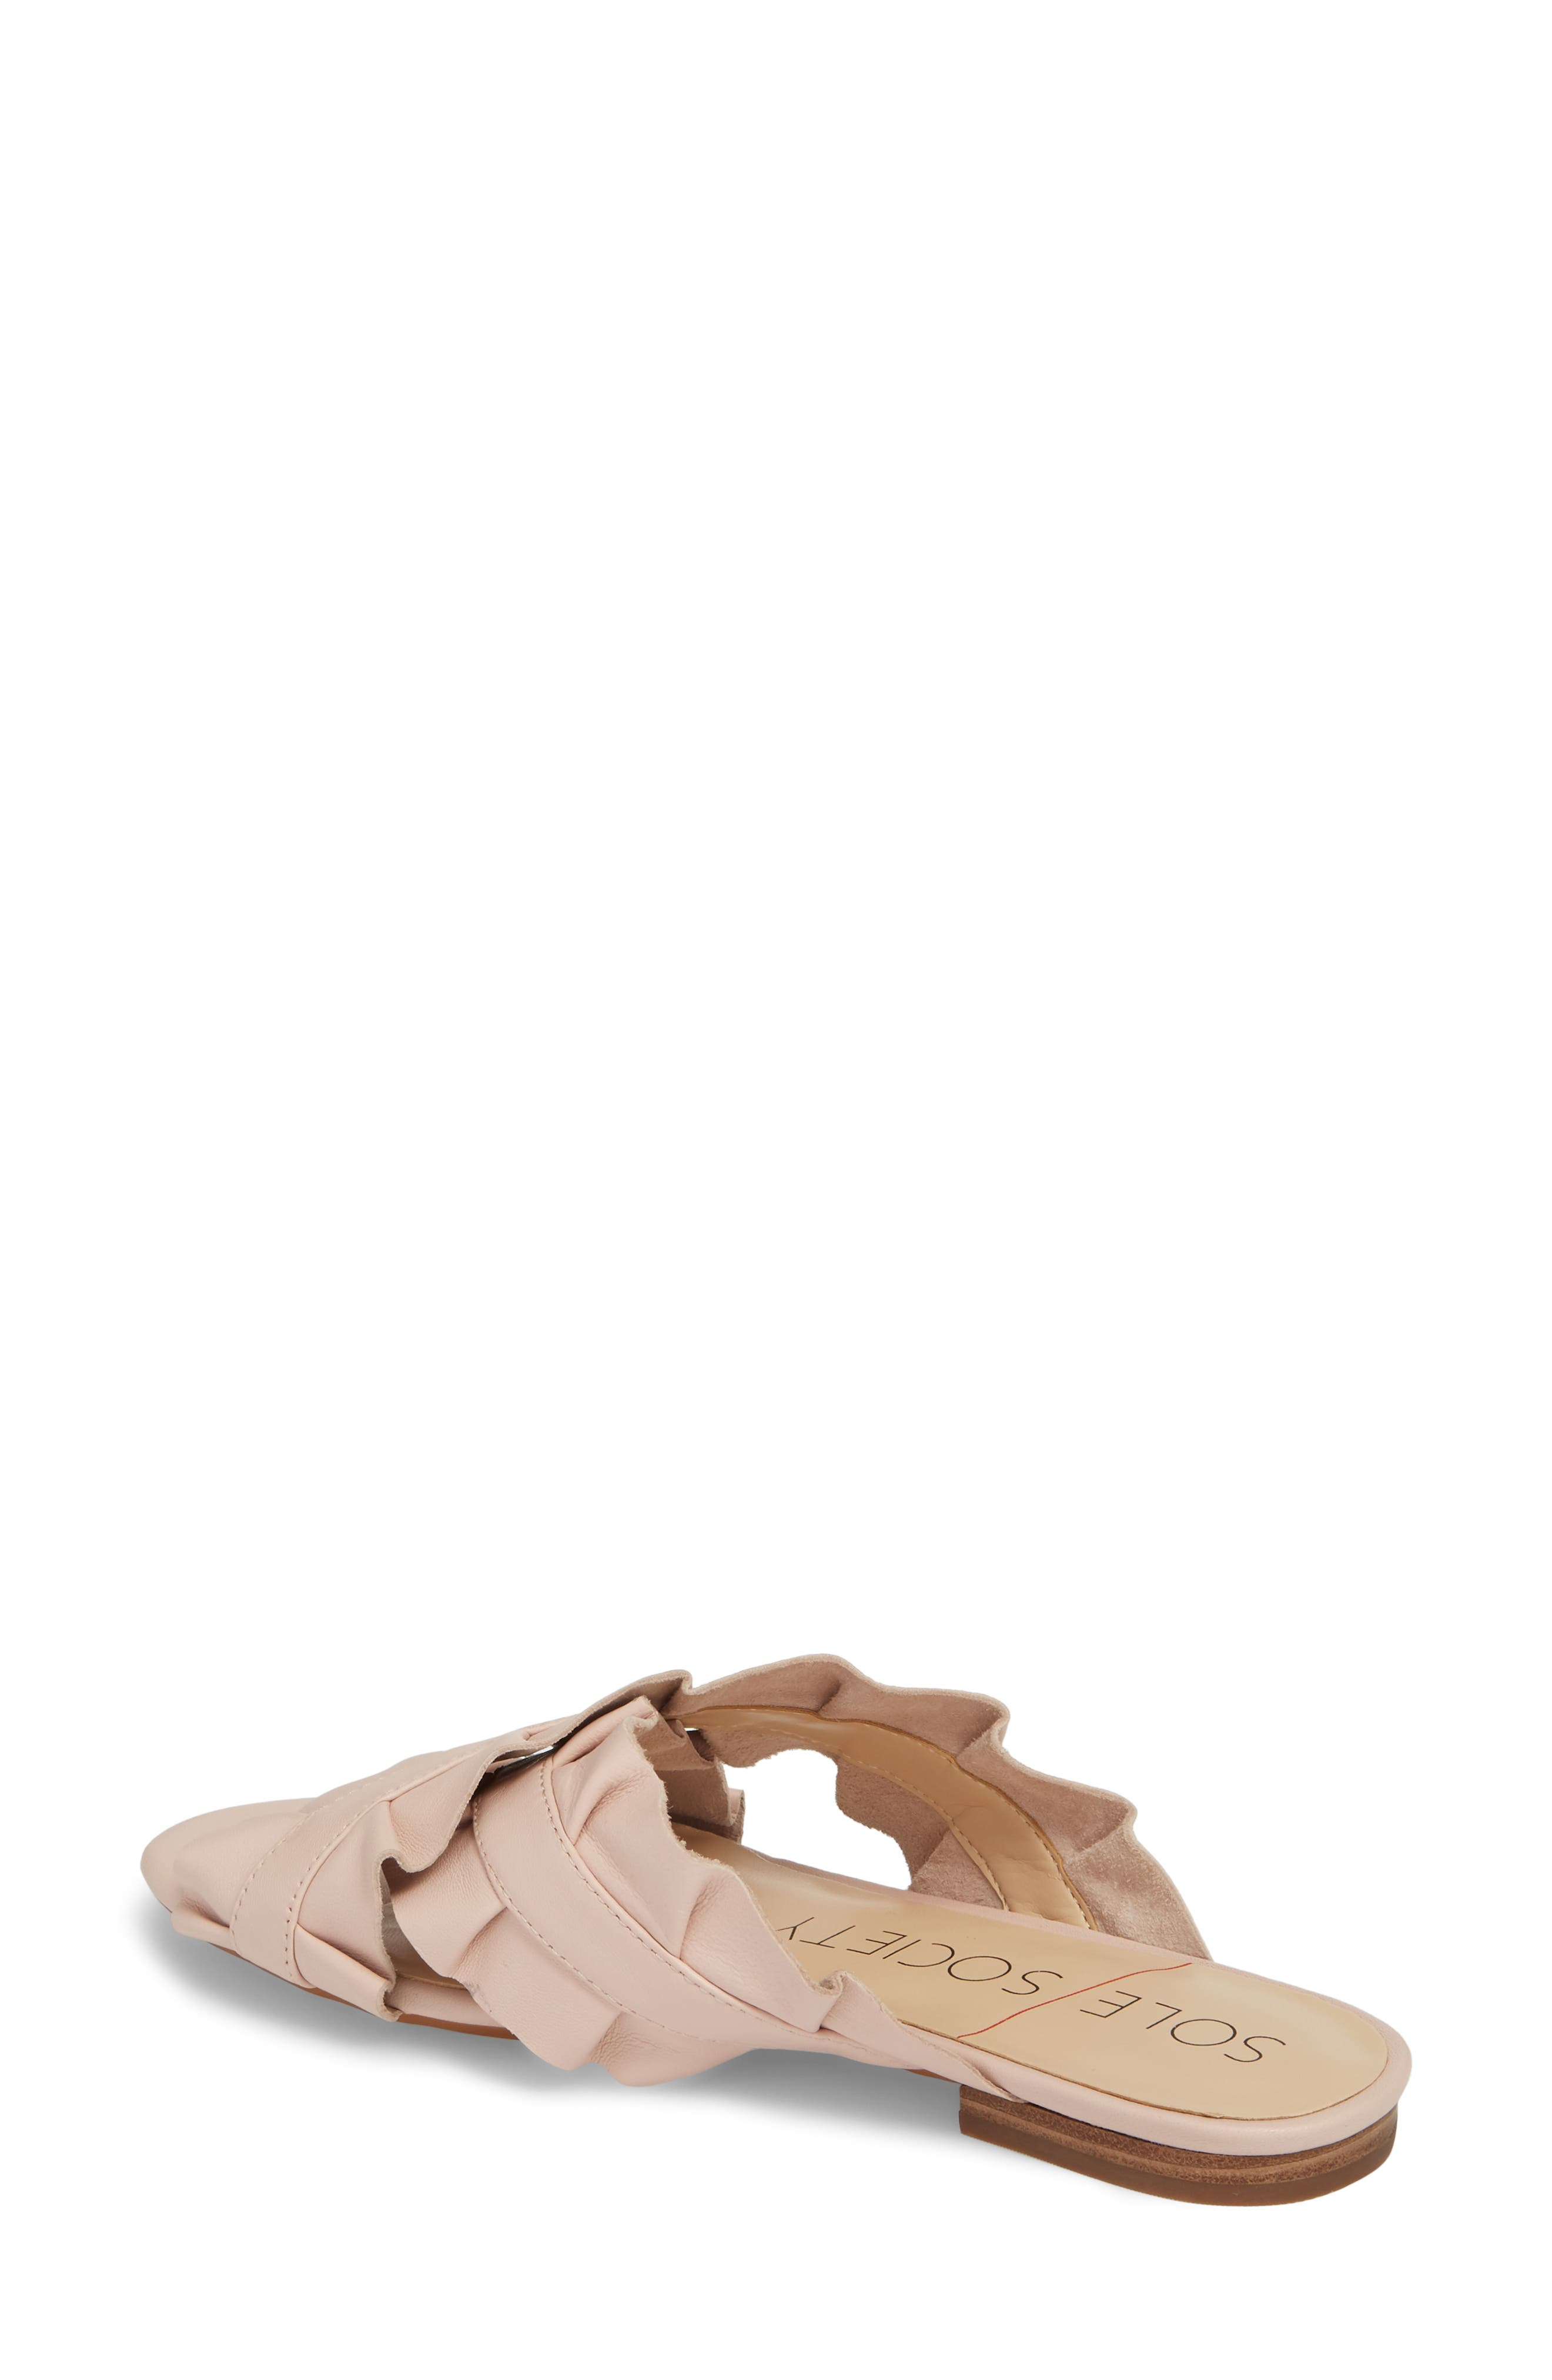 Mandi Slide Sandal,                             Alternate thumbnail 2, color,                             Spring Blush